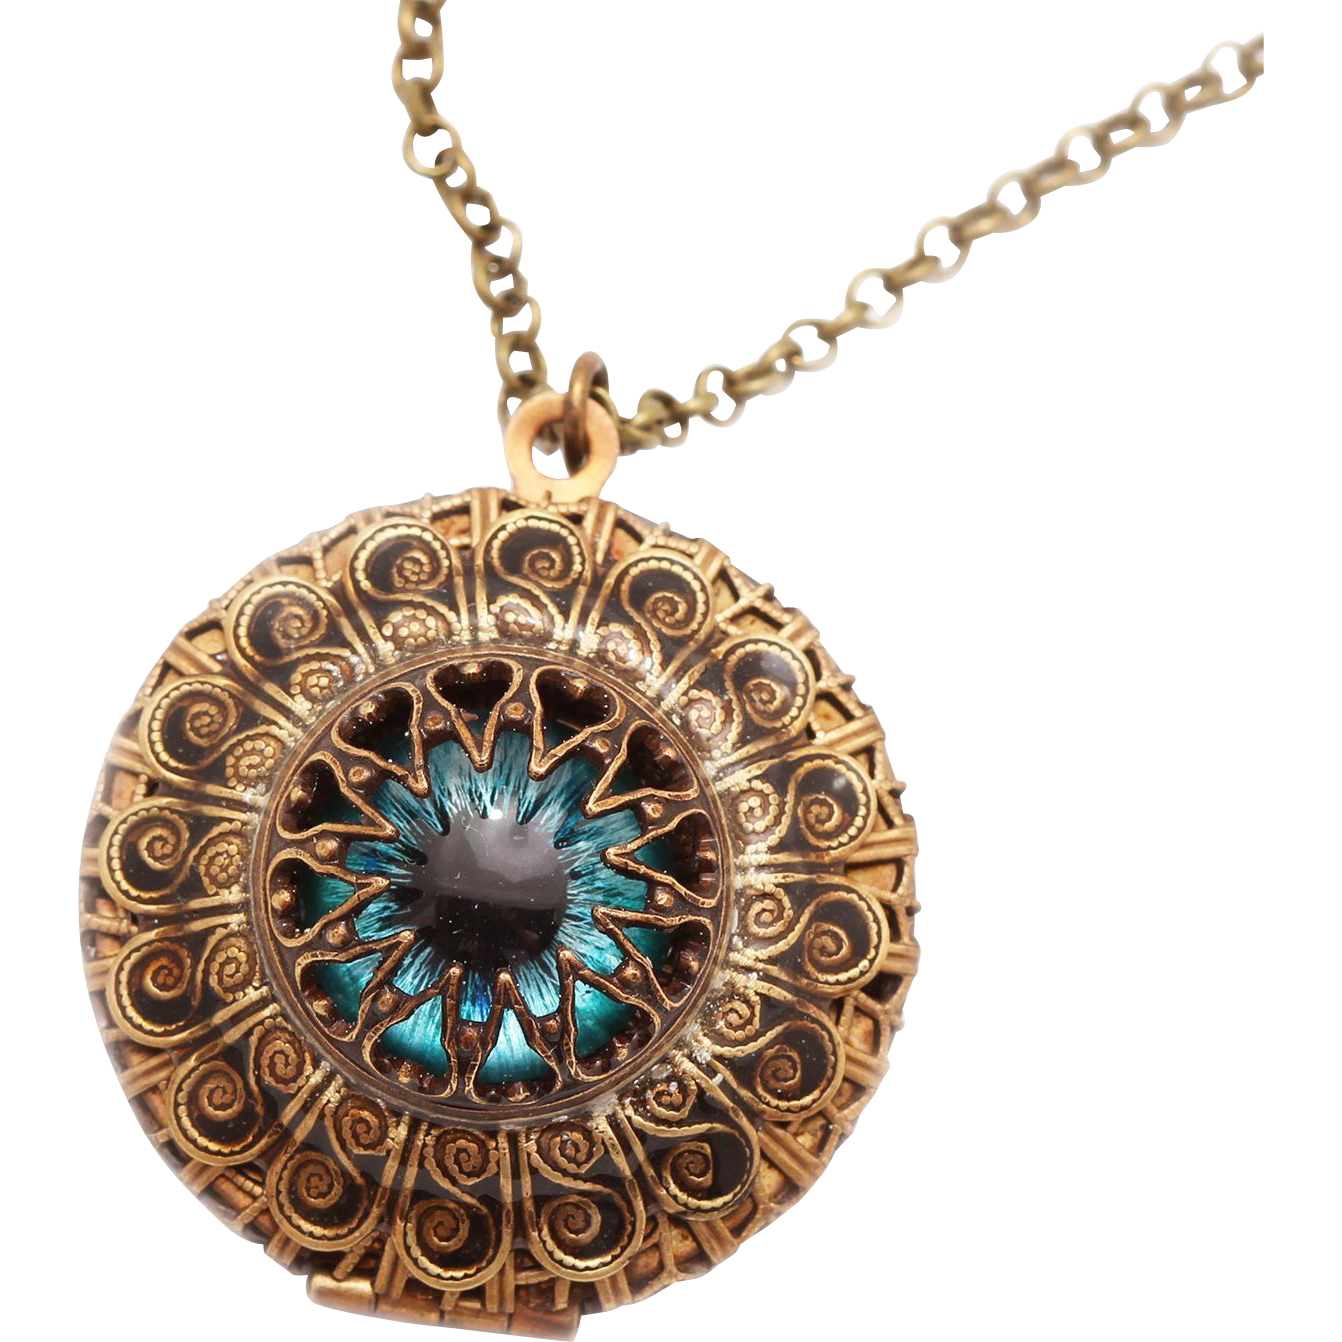 Compass Locket Necklace Evil Eye Locket Compass Necklace Evil Eye Necklace Locket Necklace